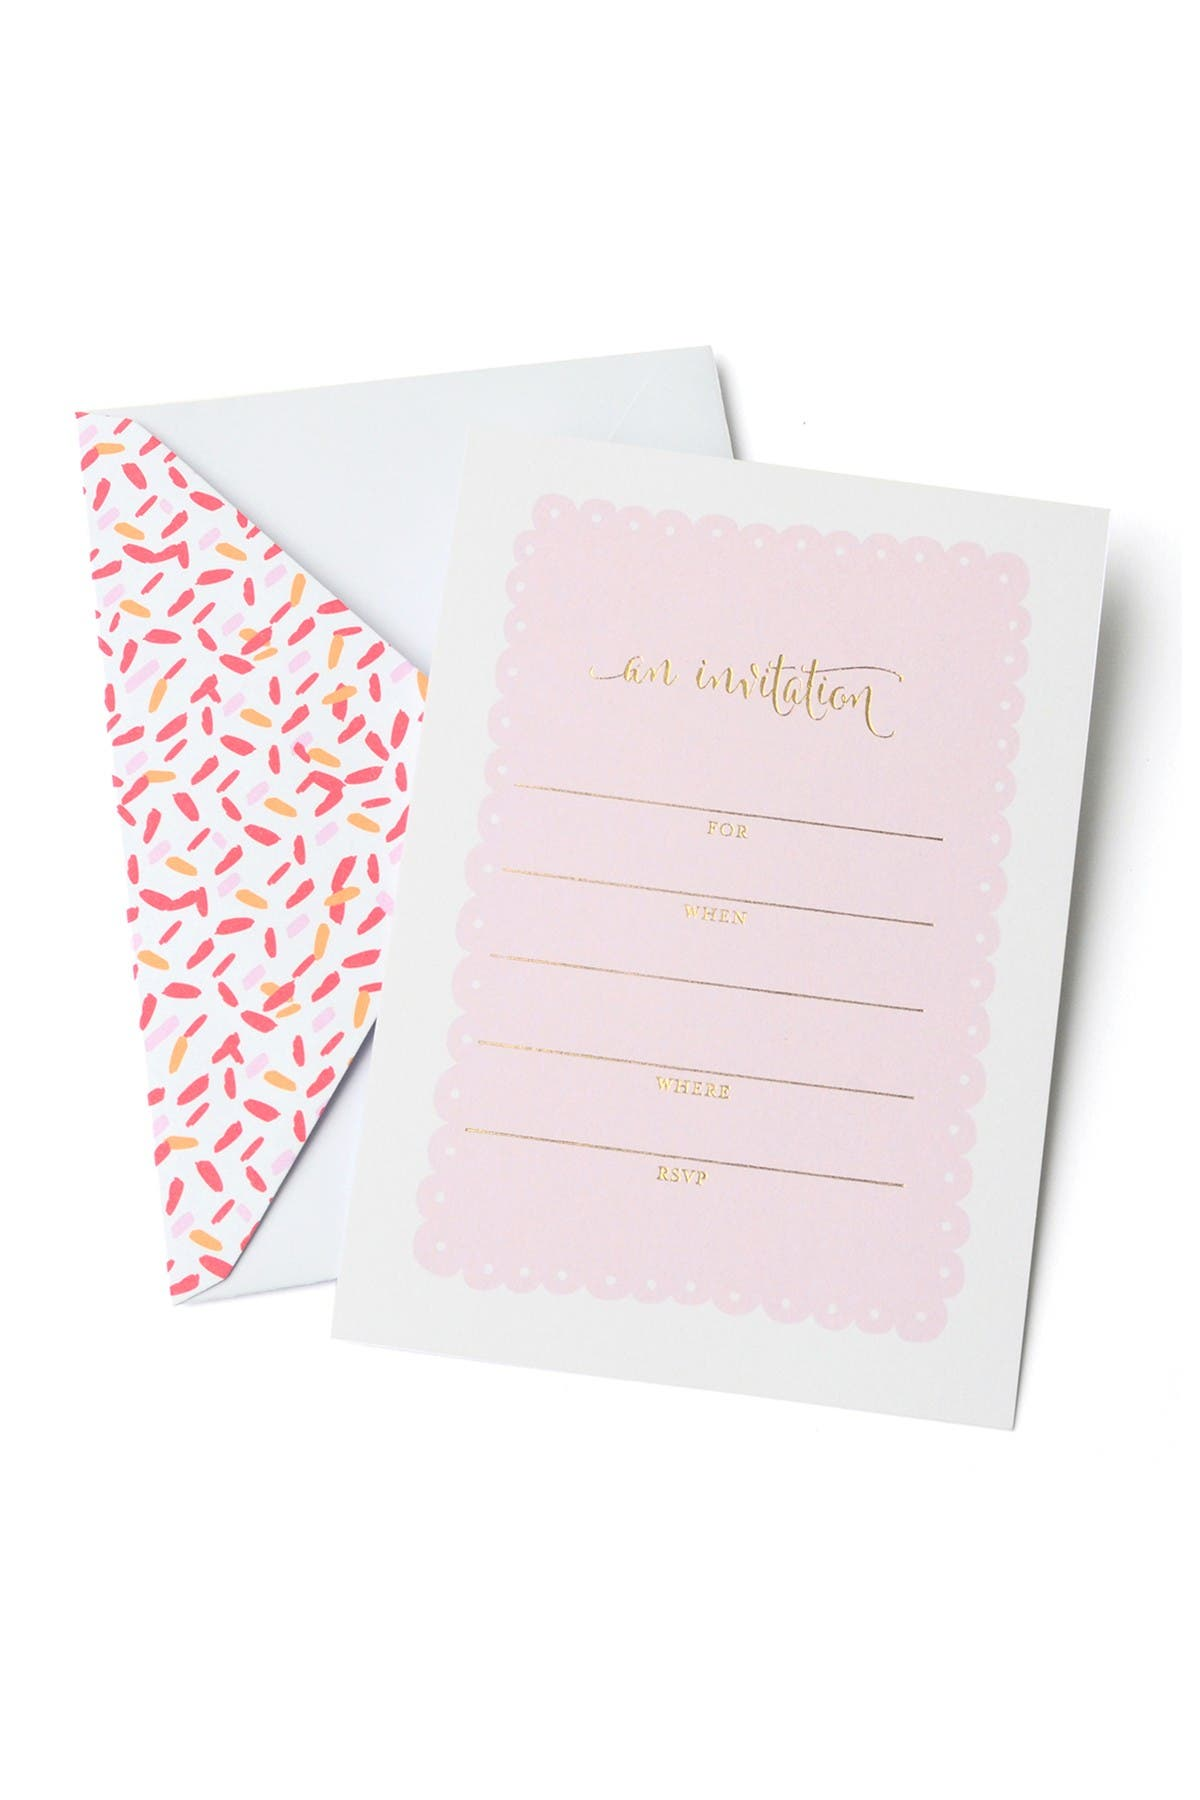 Image of GARTNER STUDIOS Pink & Gold Write-In Invitations - 60-Count